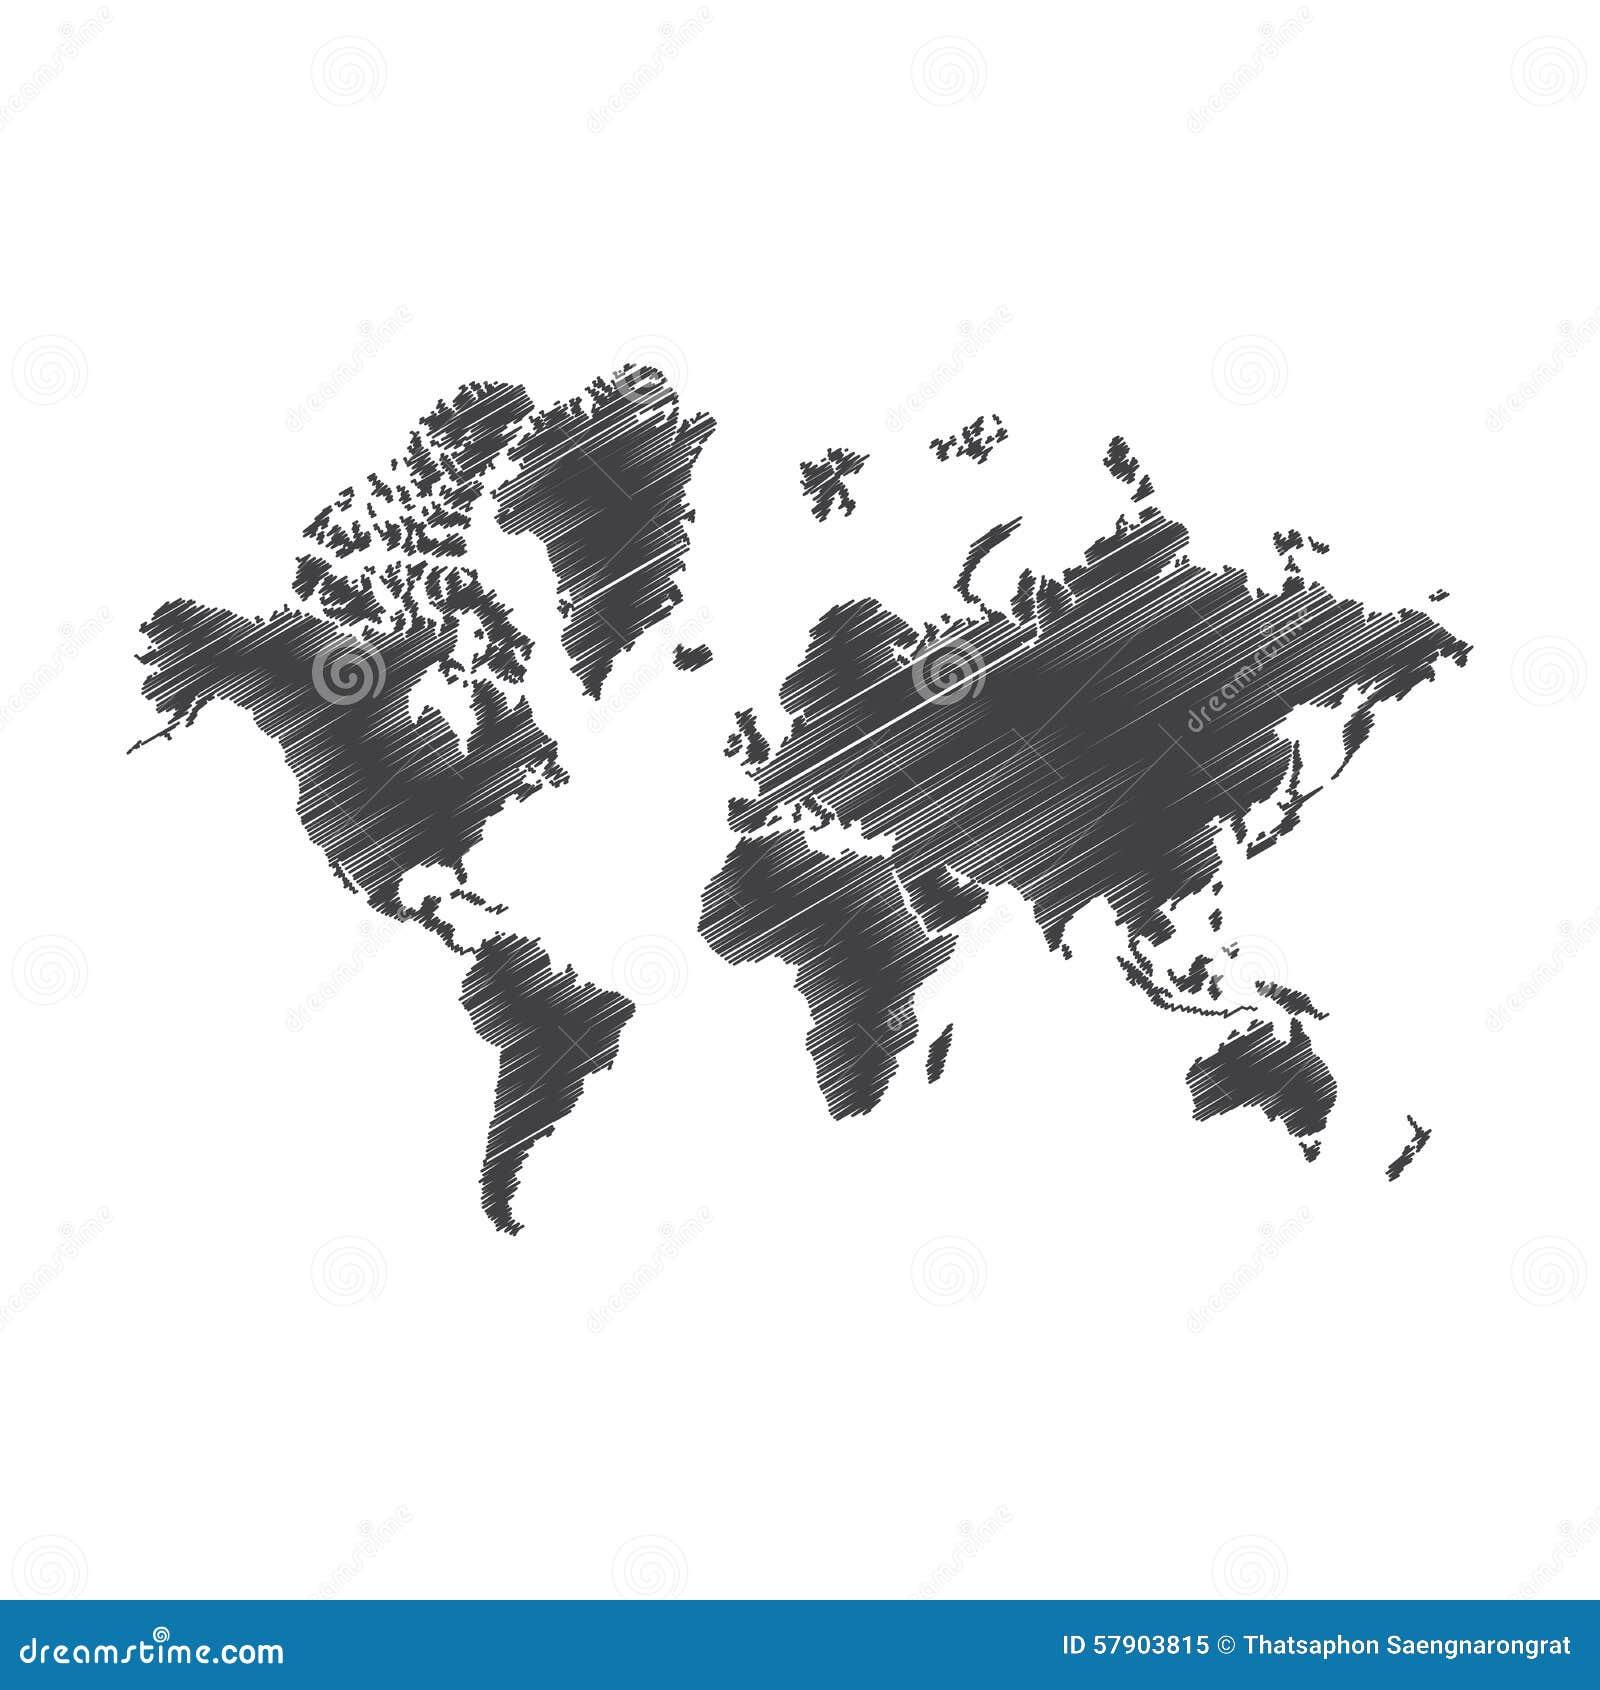 Pen art sketch drawing world map illustration stock vector art drawing illustration map pen sketch web world sciox Images